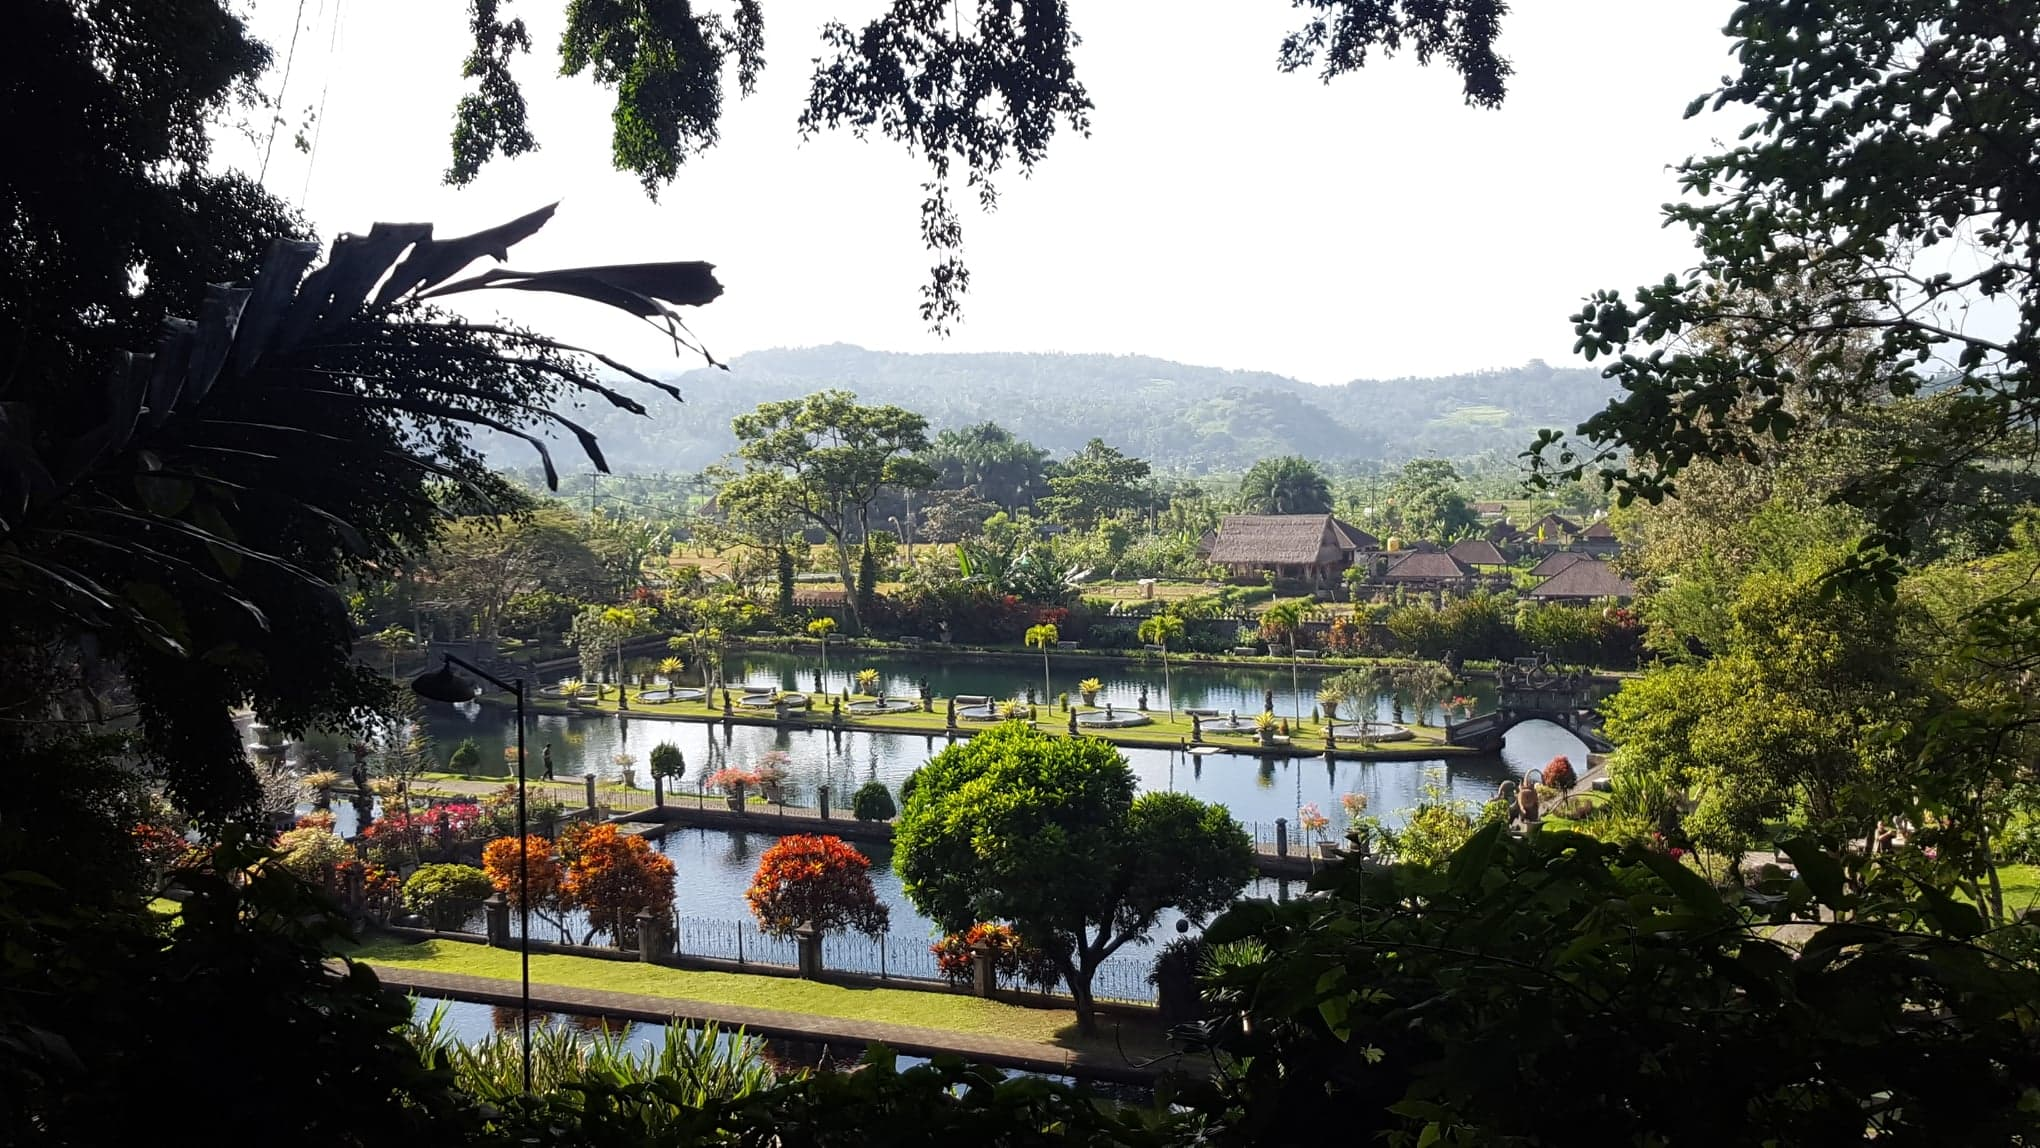 Les bains royaux de Tirta Gangga